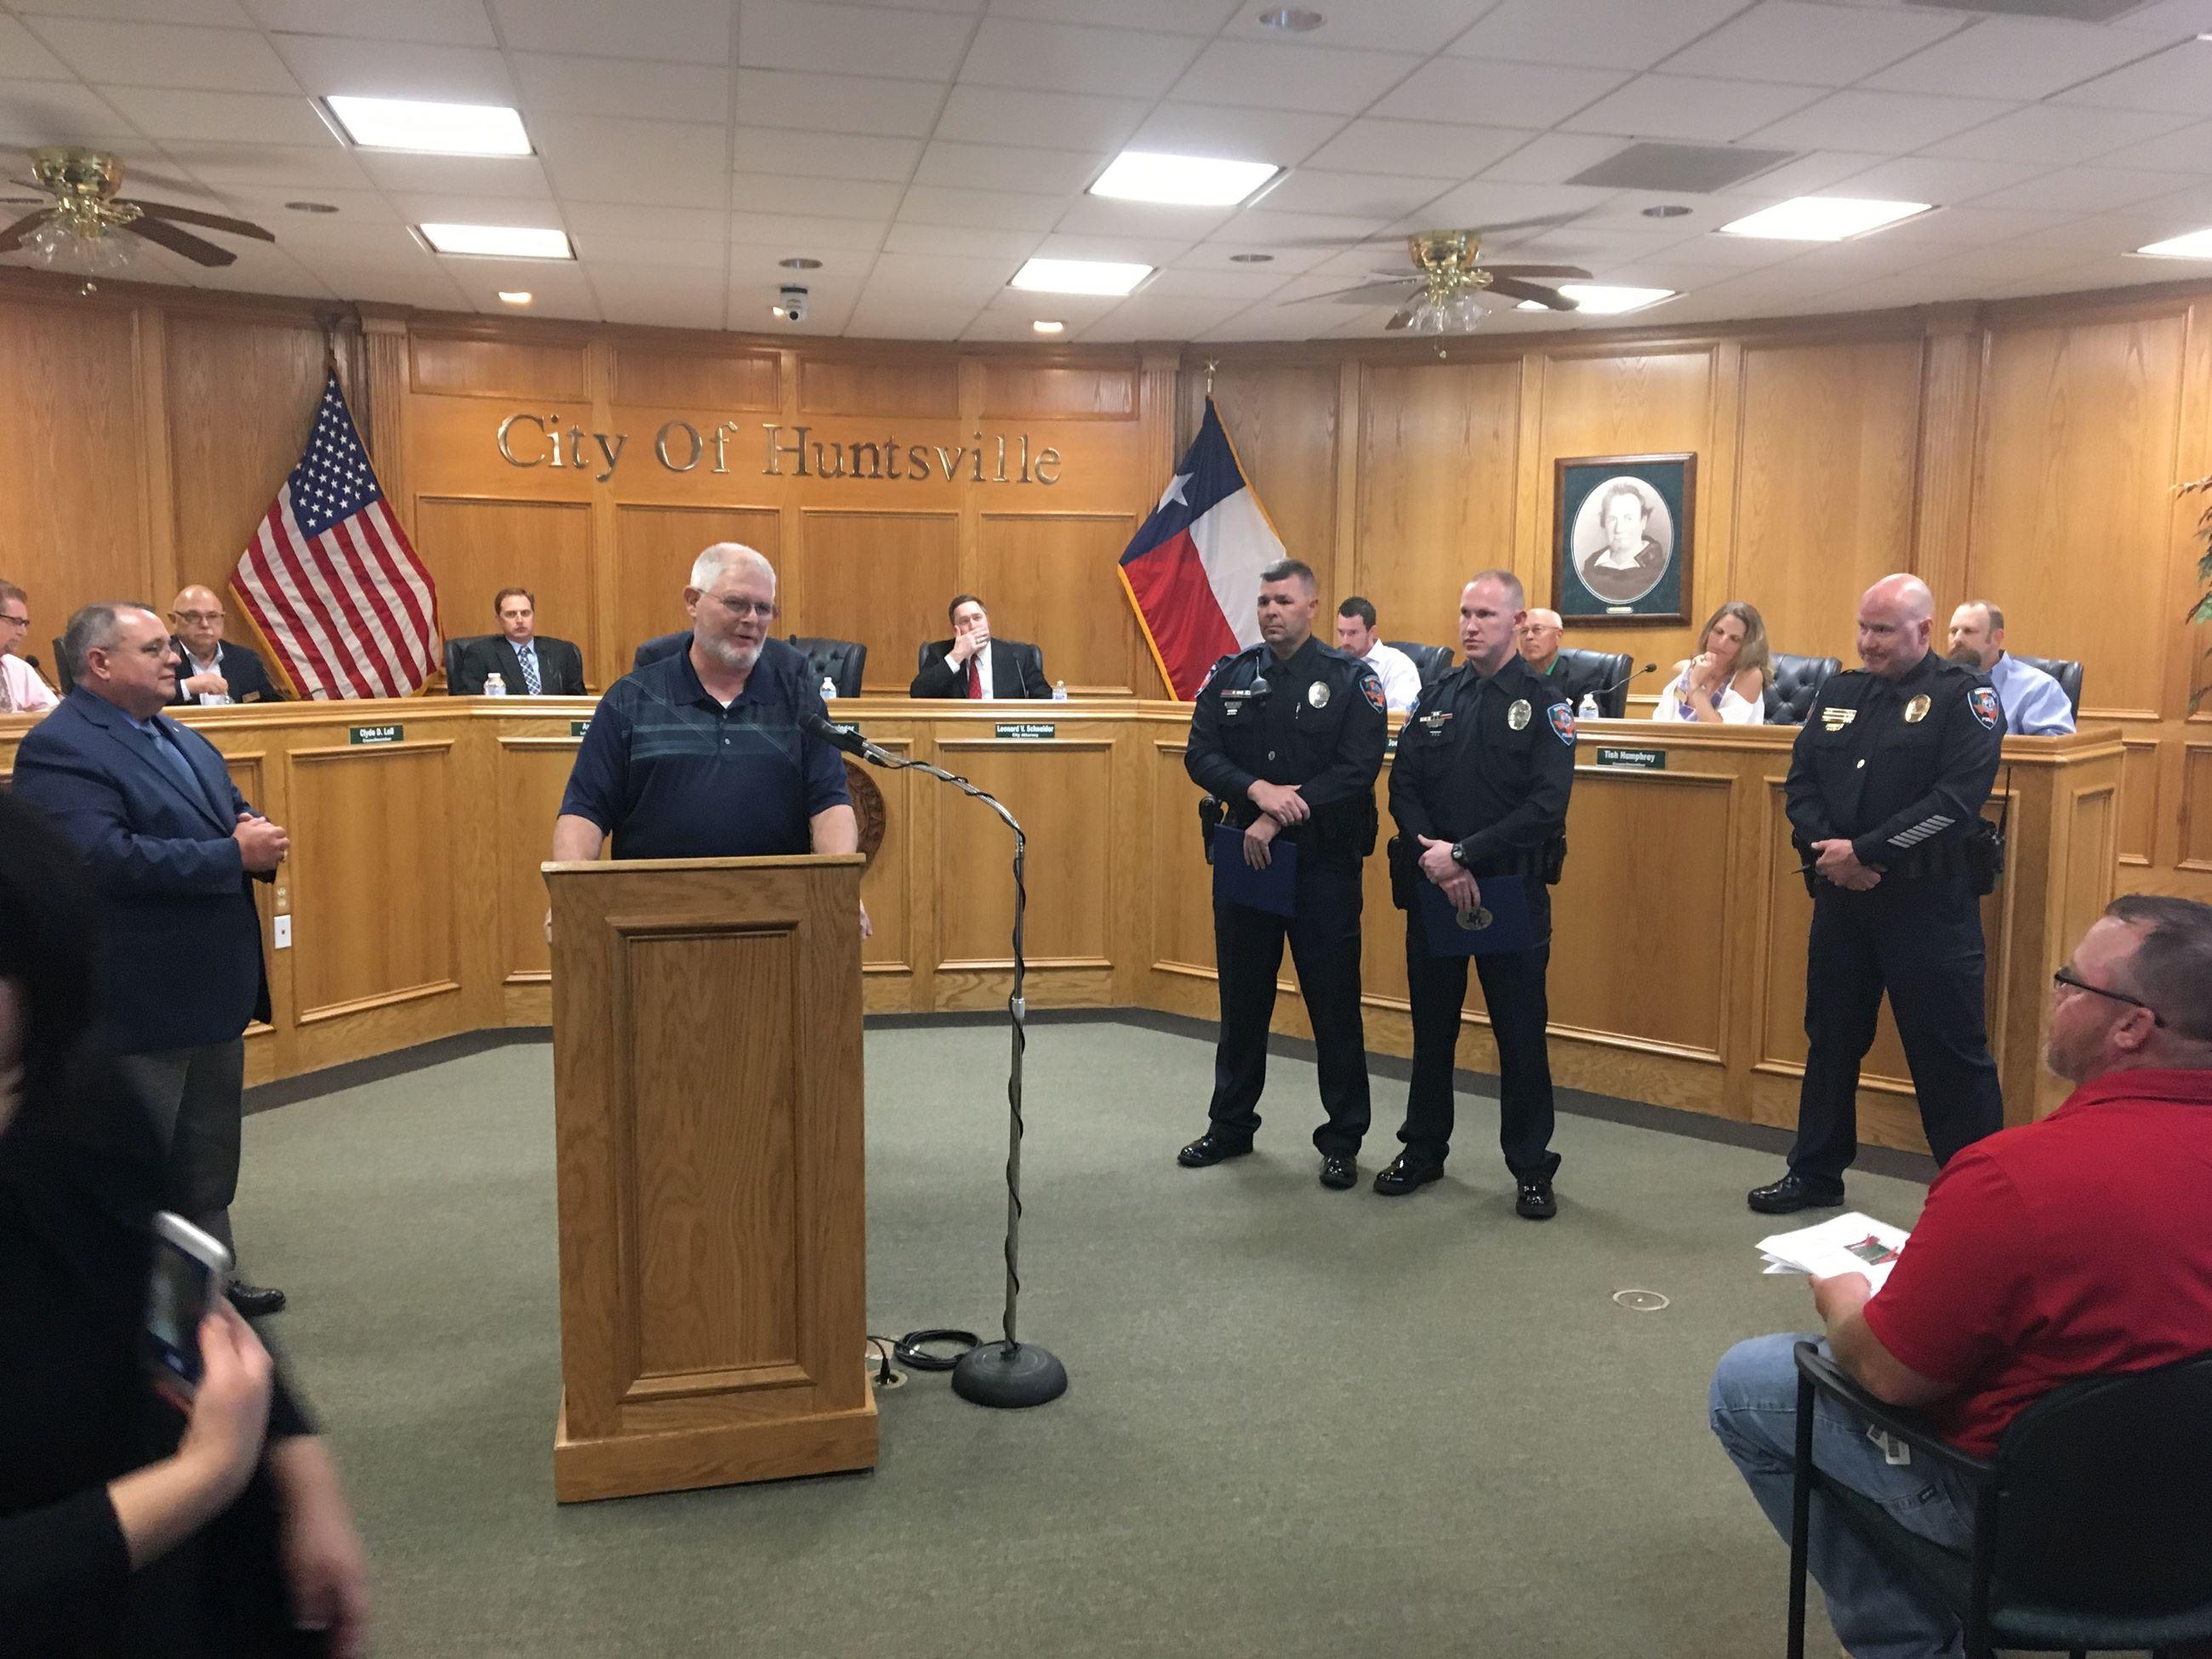 Huntsville, TX - Official Website